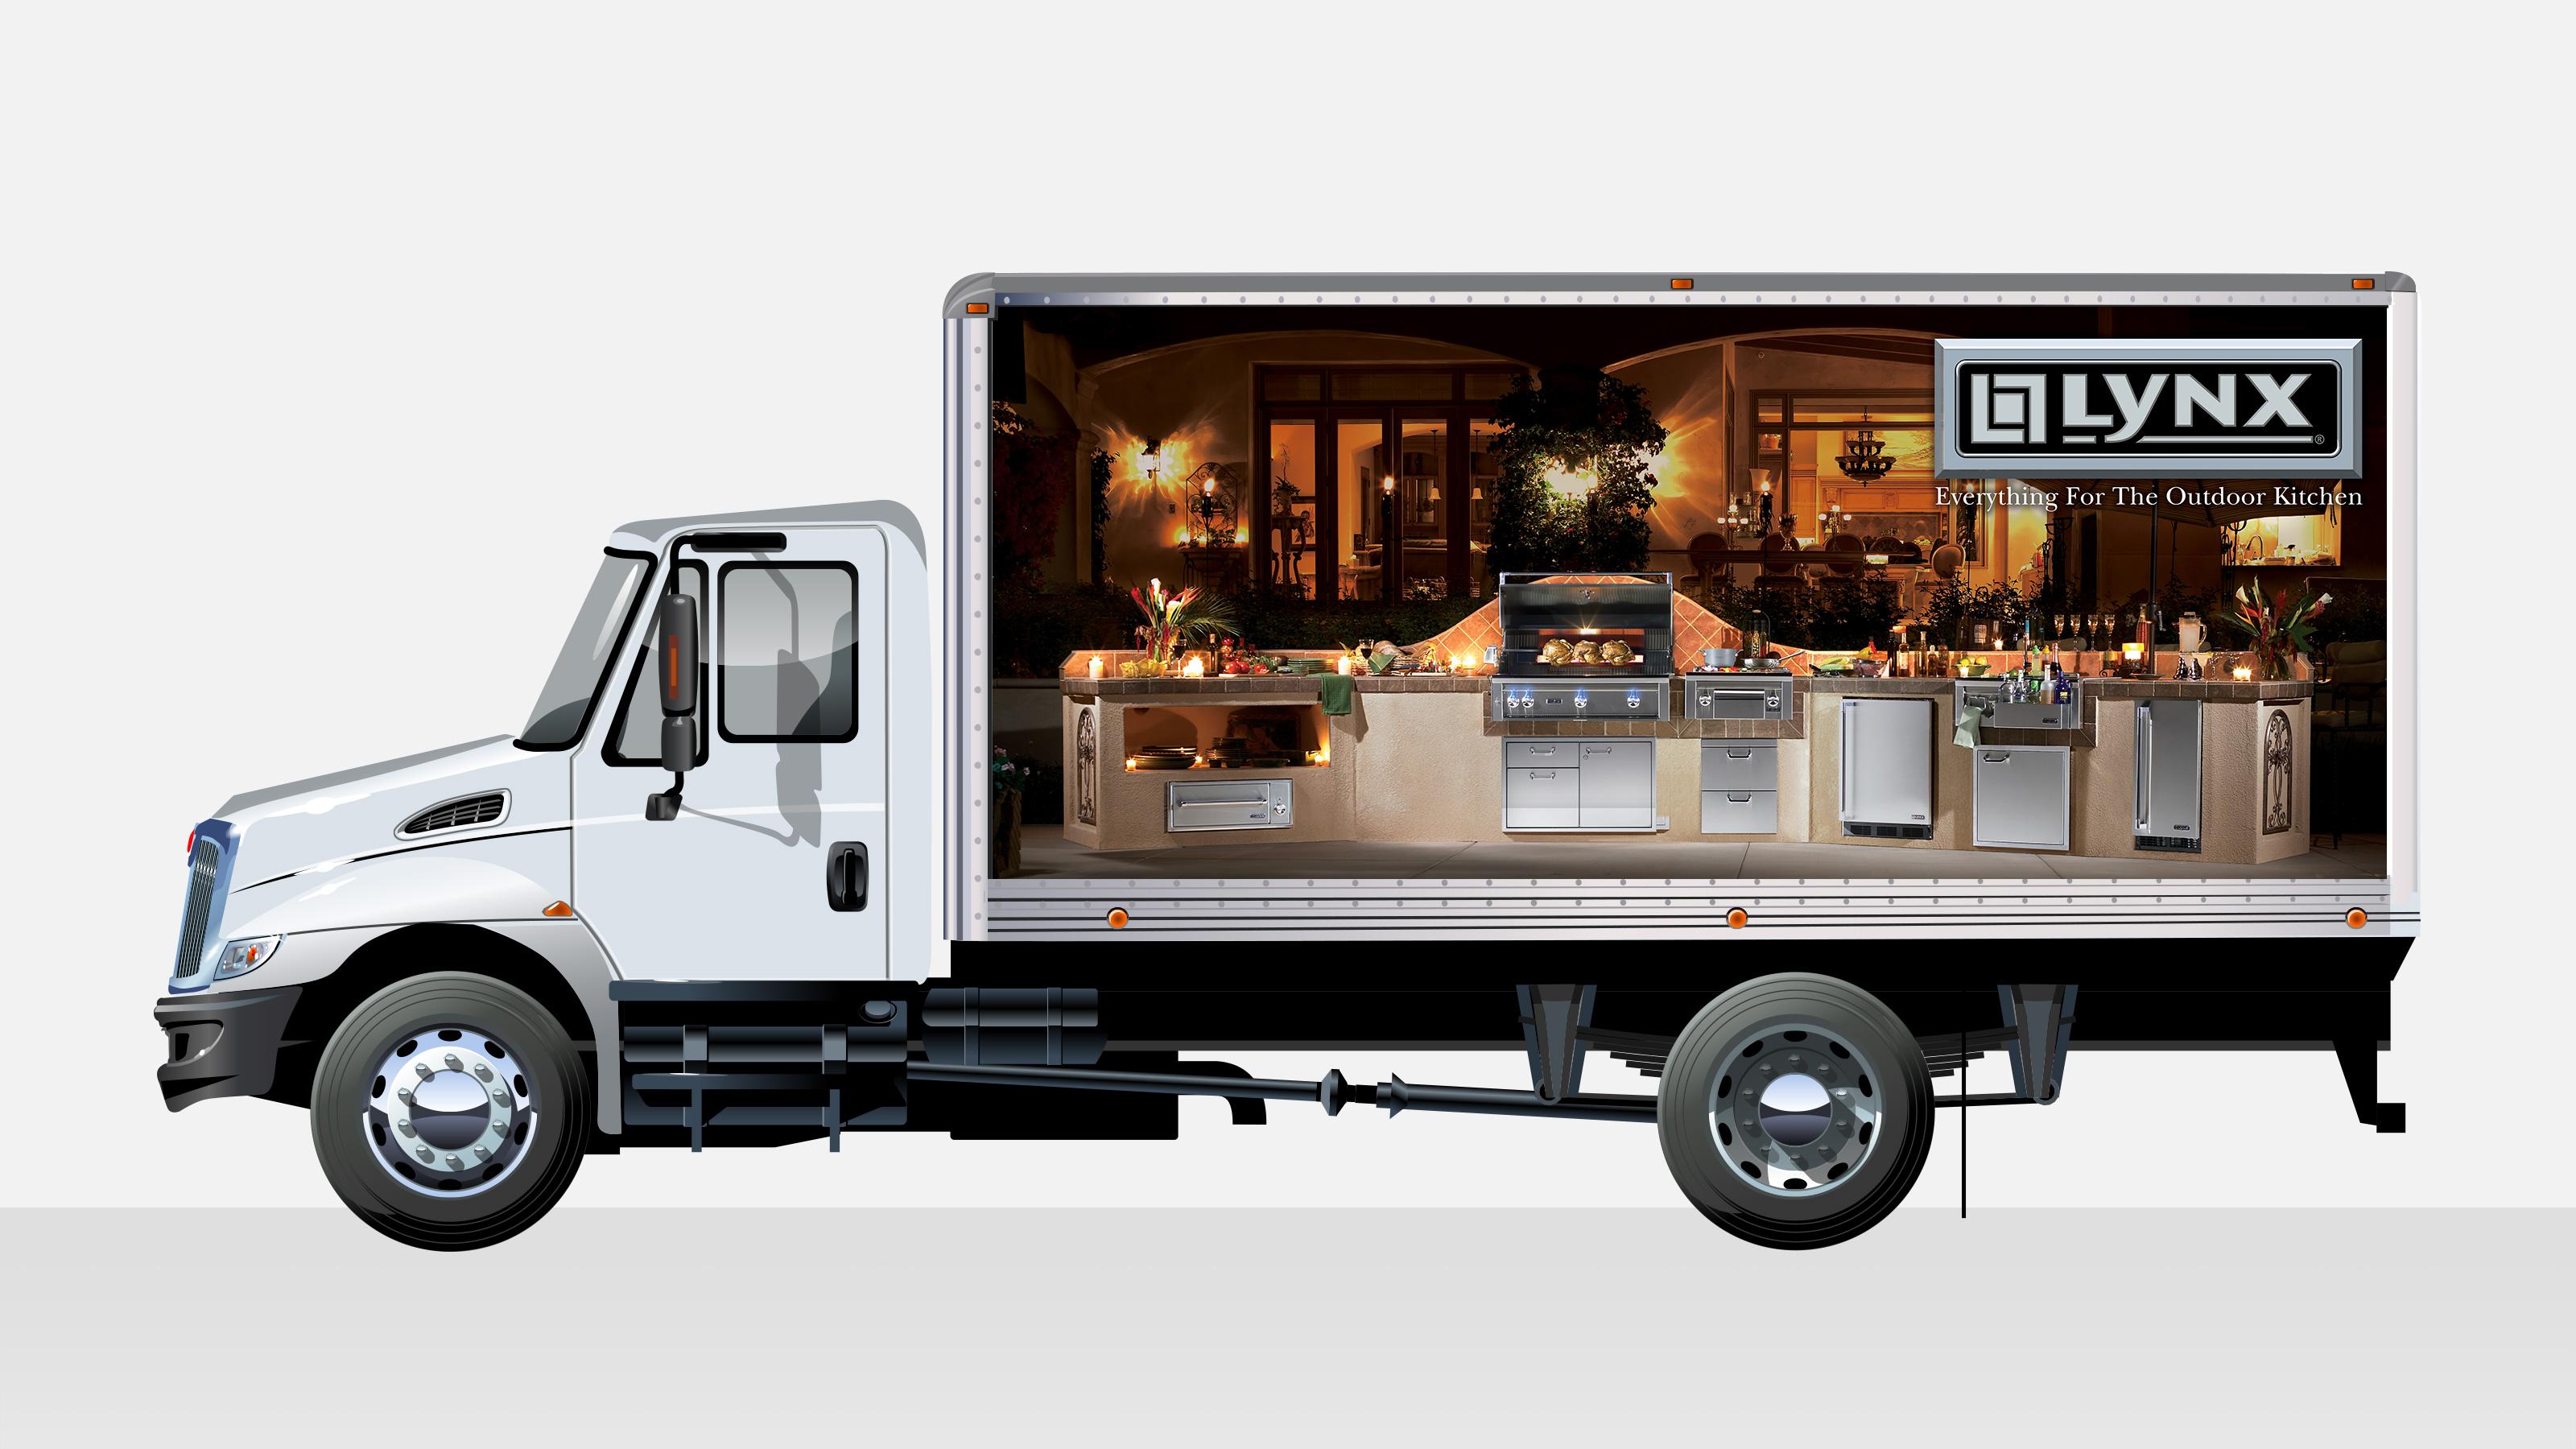 Lynx vehicle wrap ad on truck